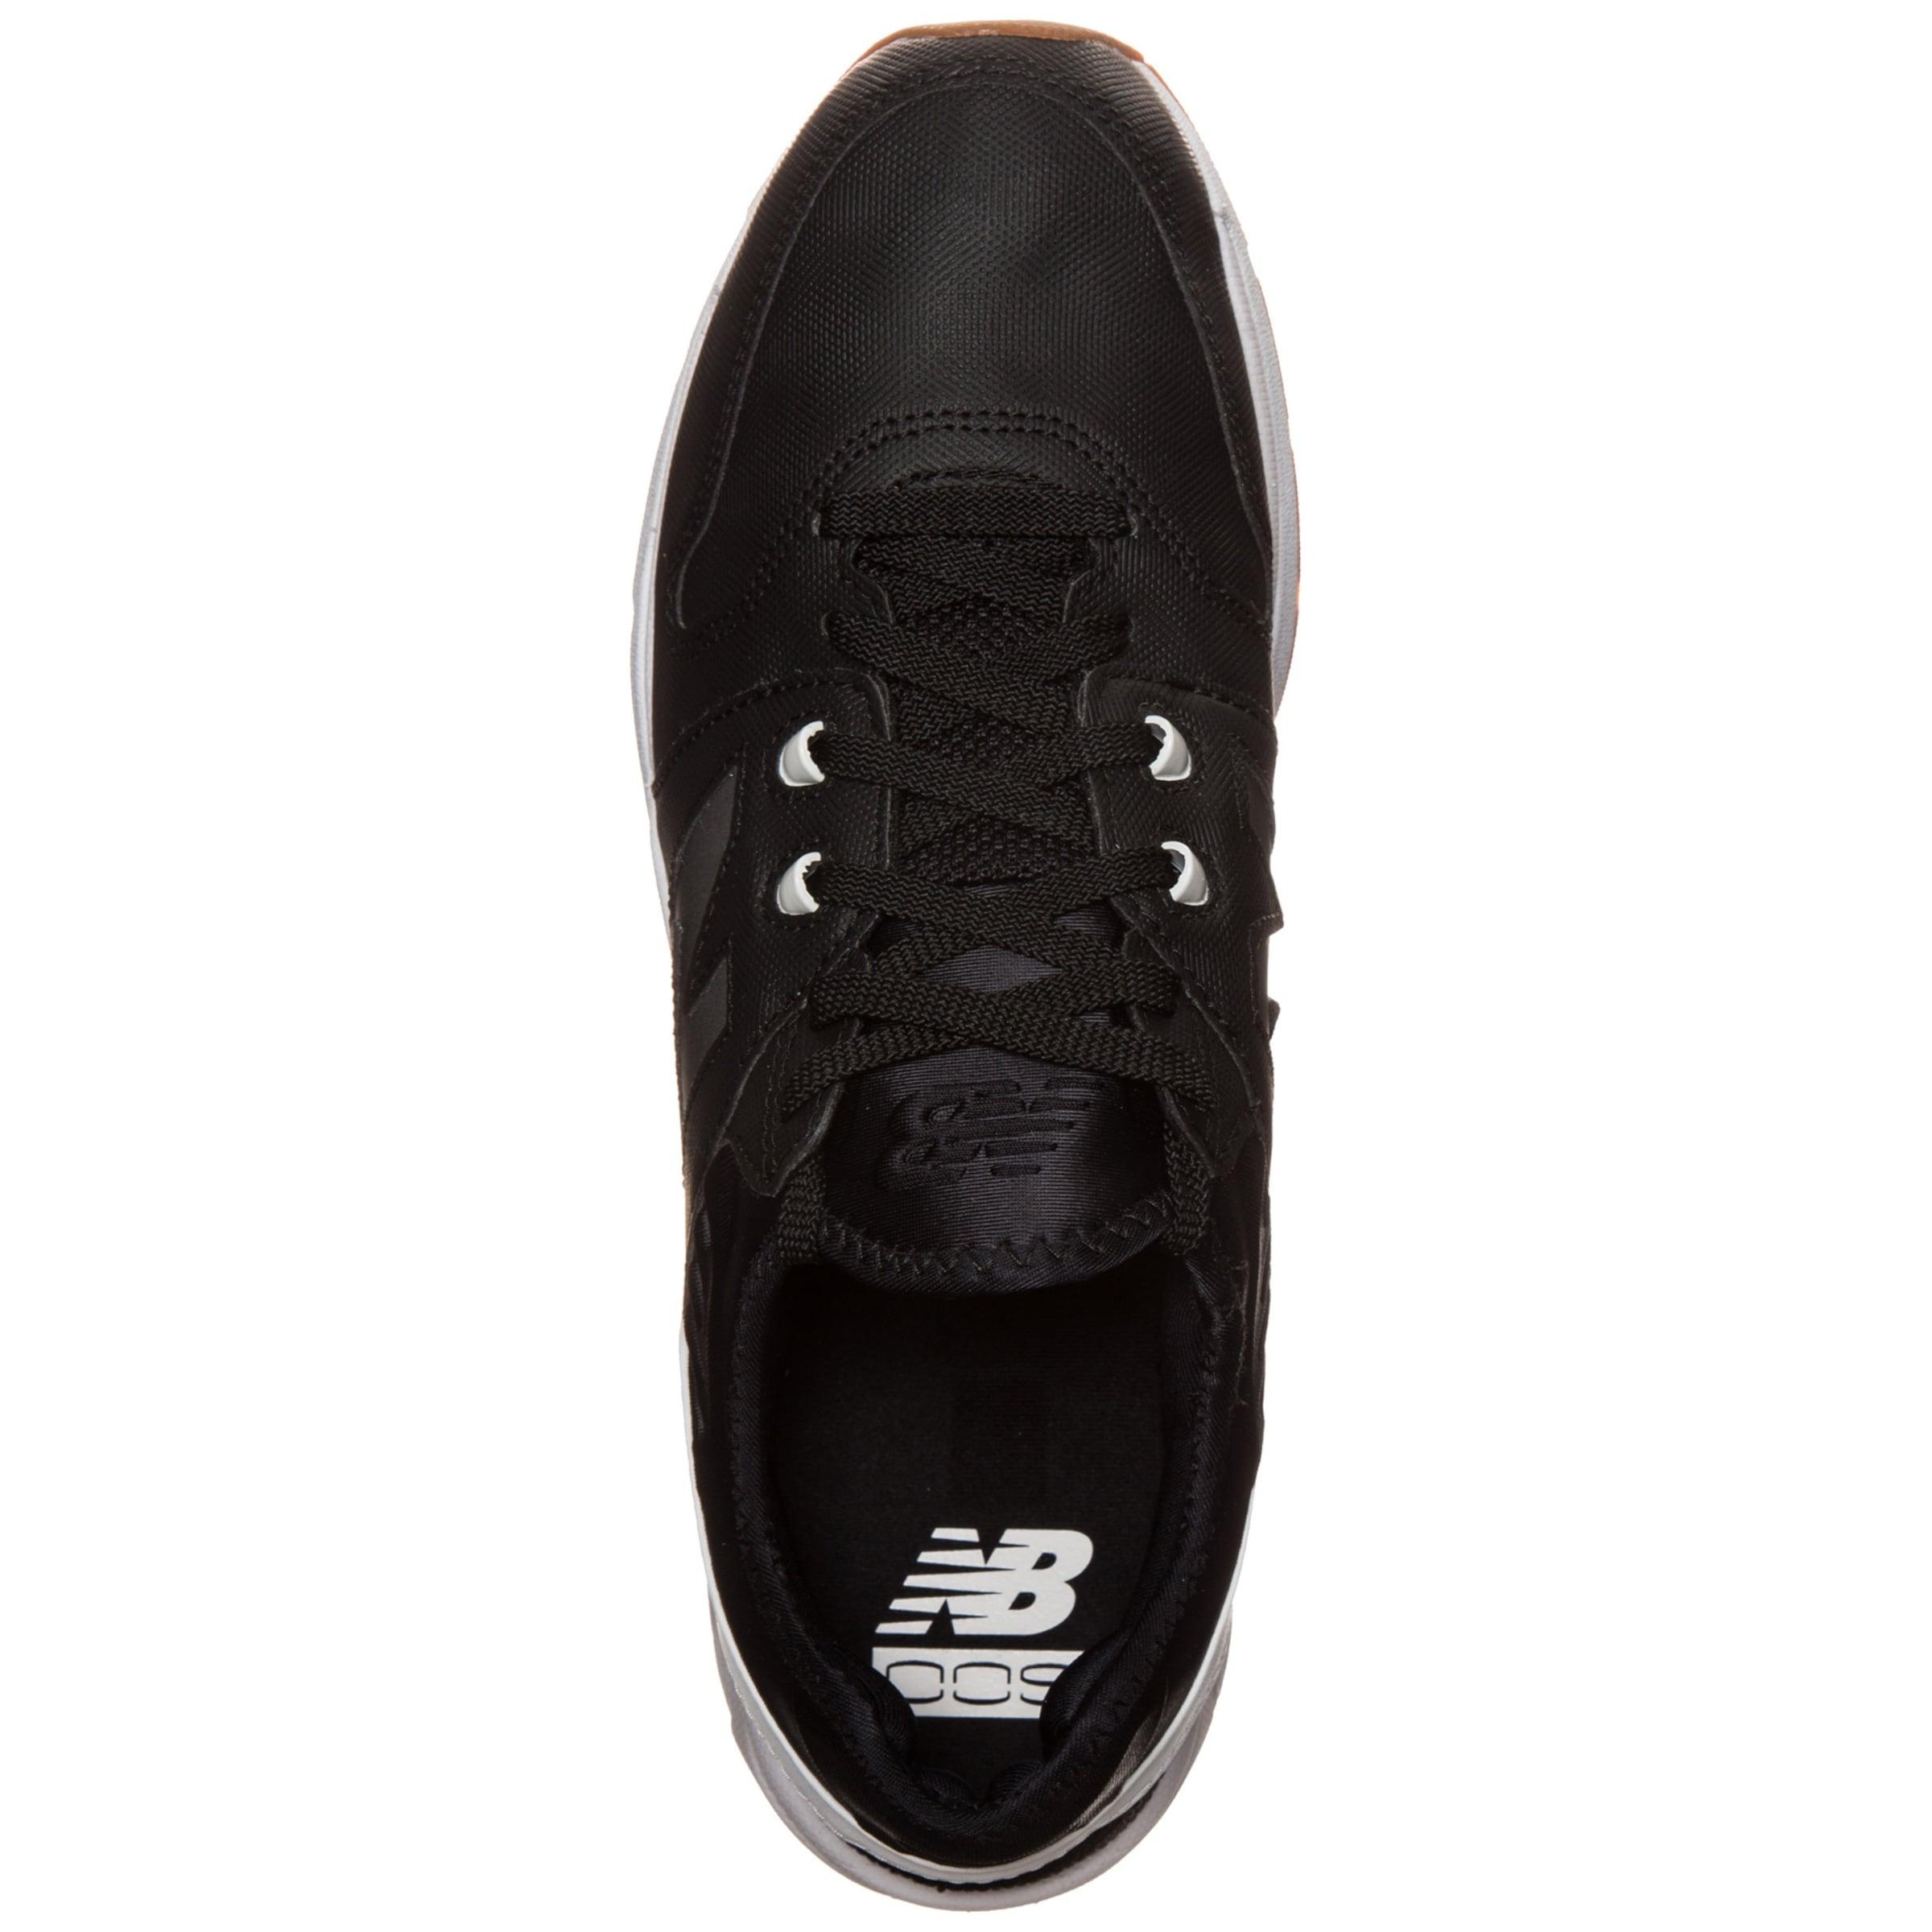 Sneaker d' New Schwarz 'ml009 Balance utb In N0POnw8kX